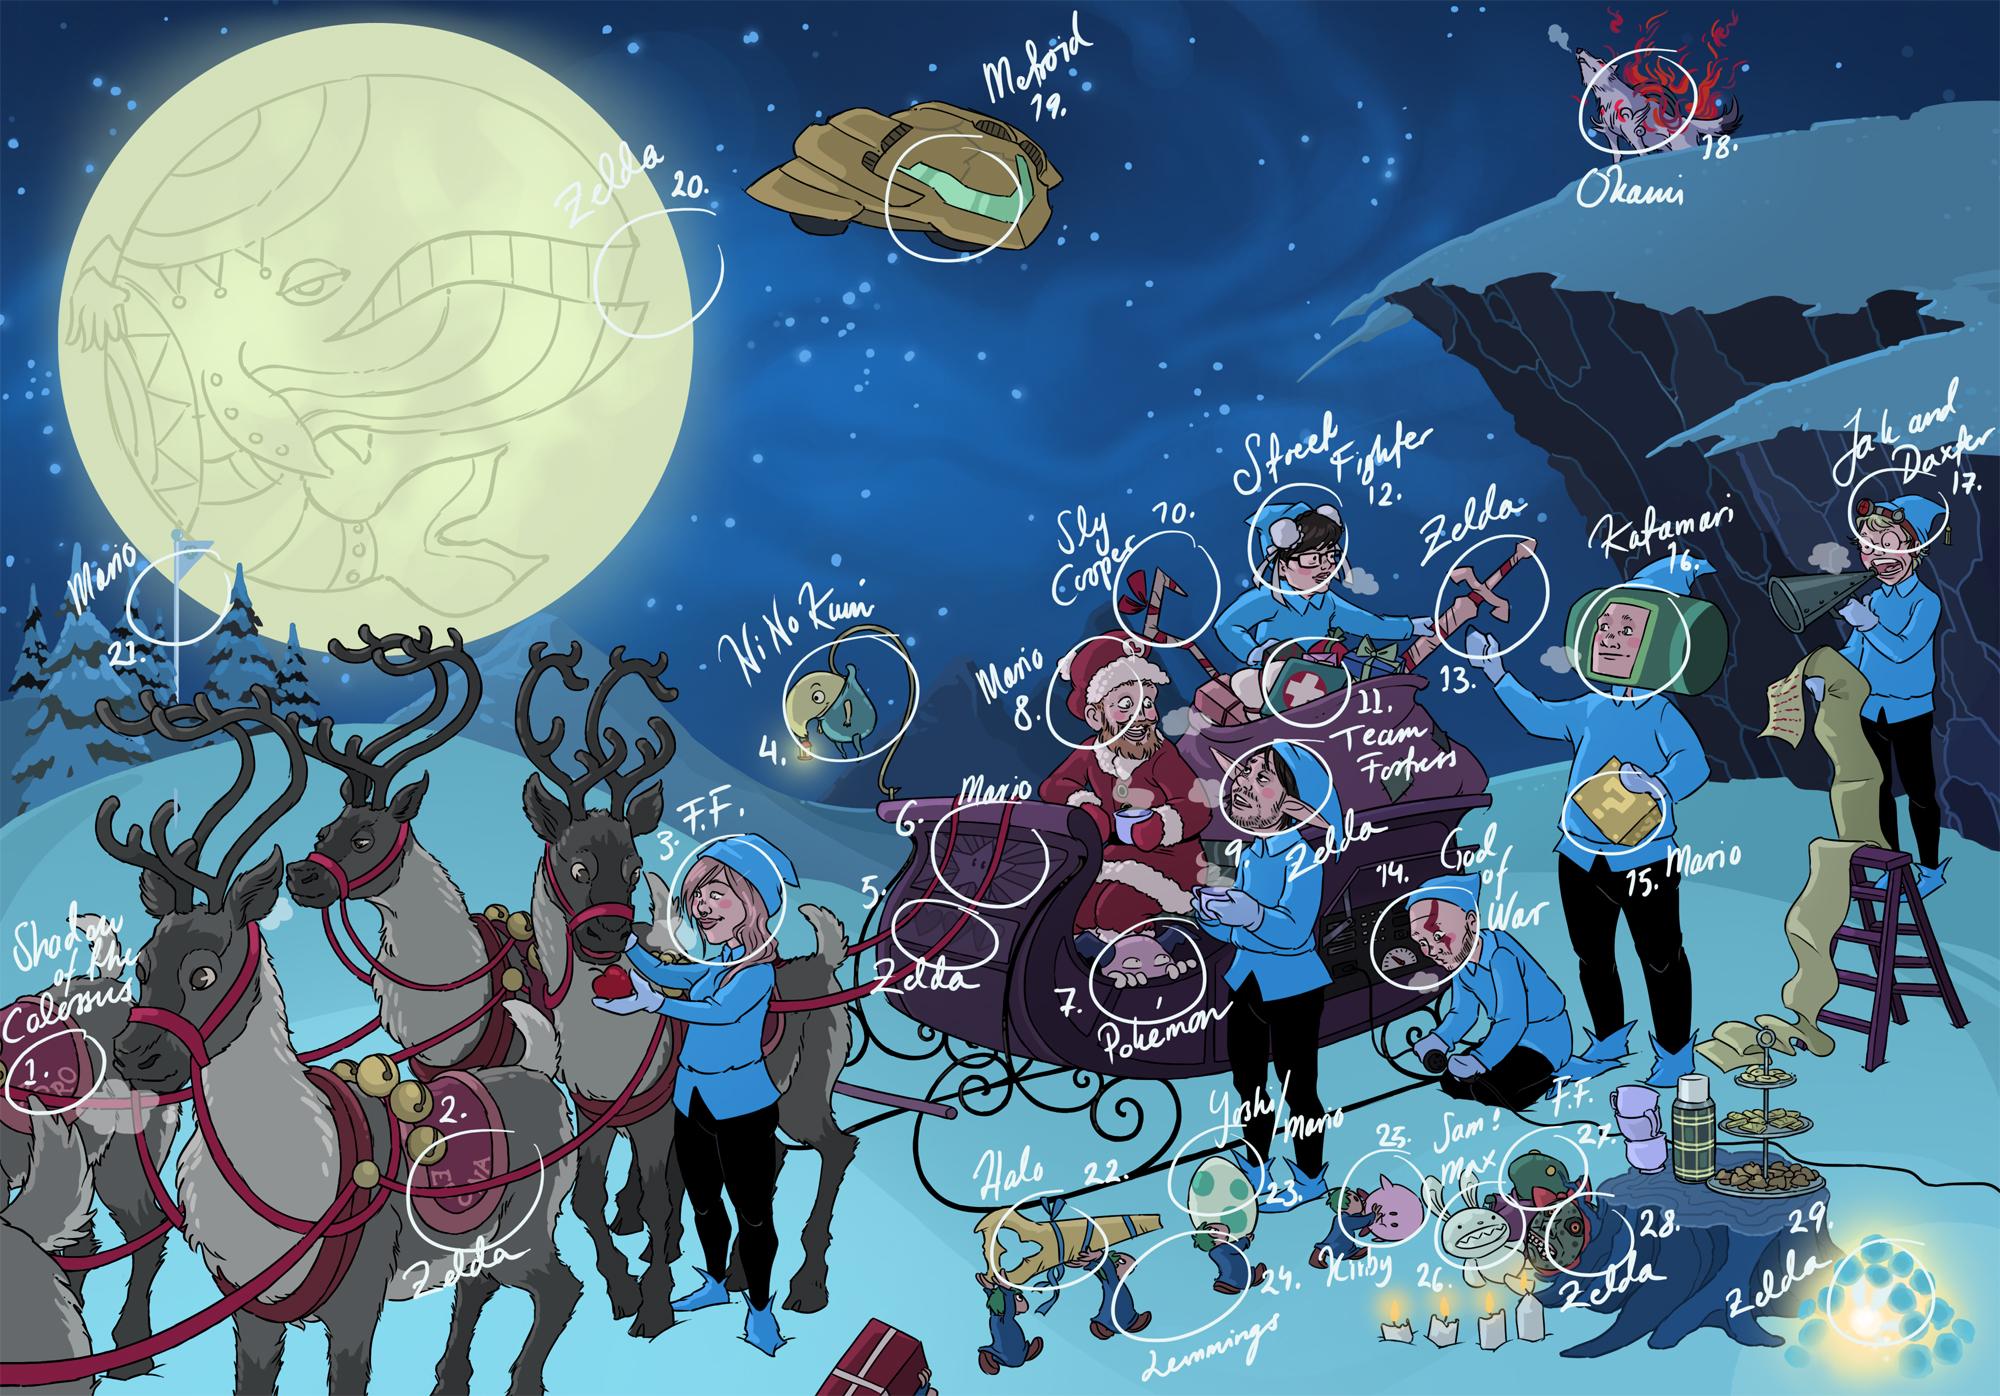 Julkalender 2013liten